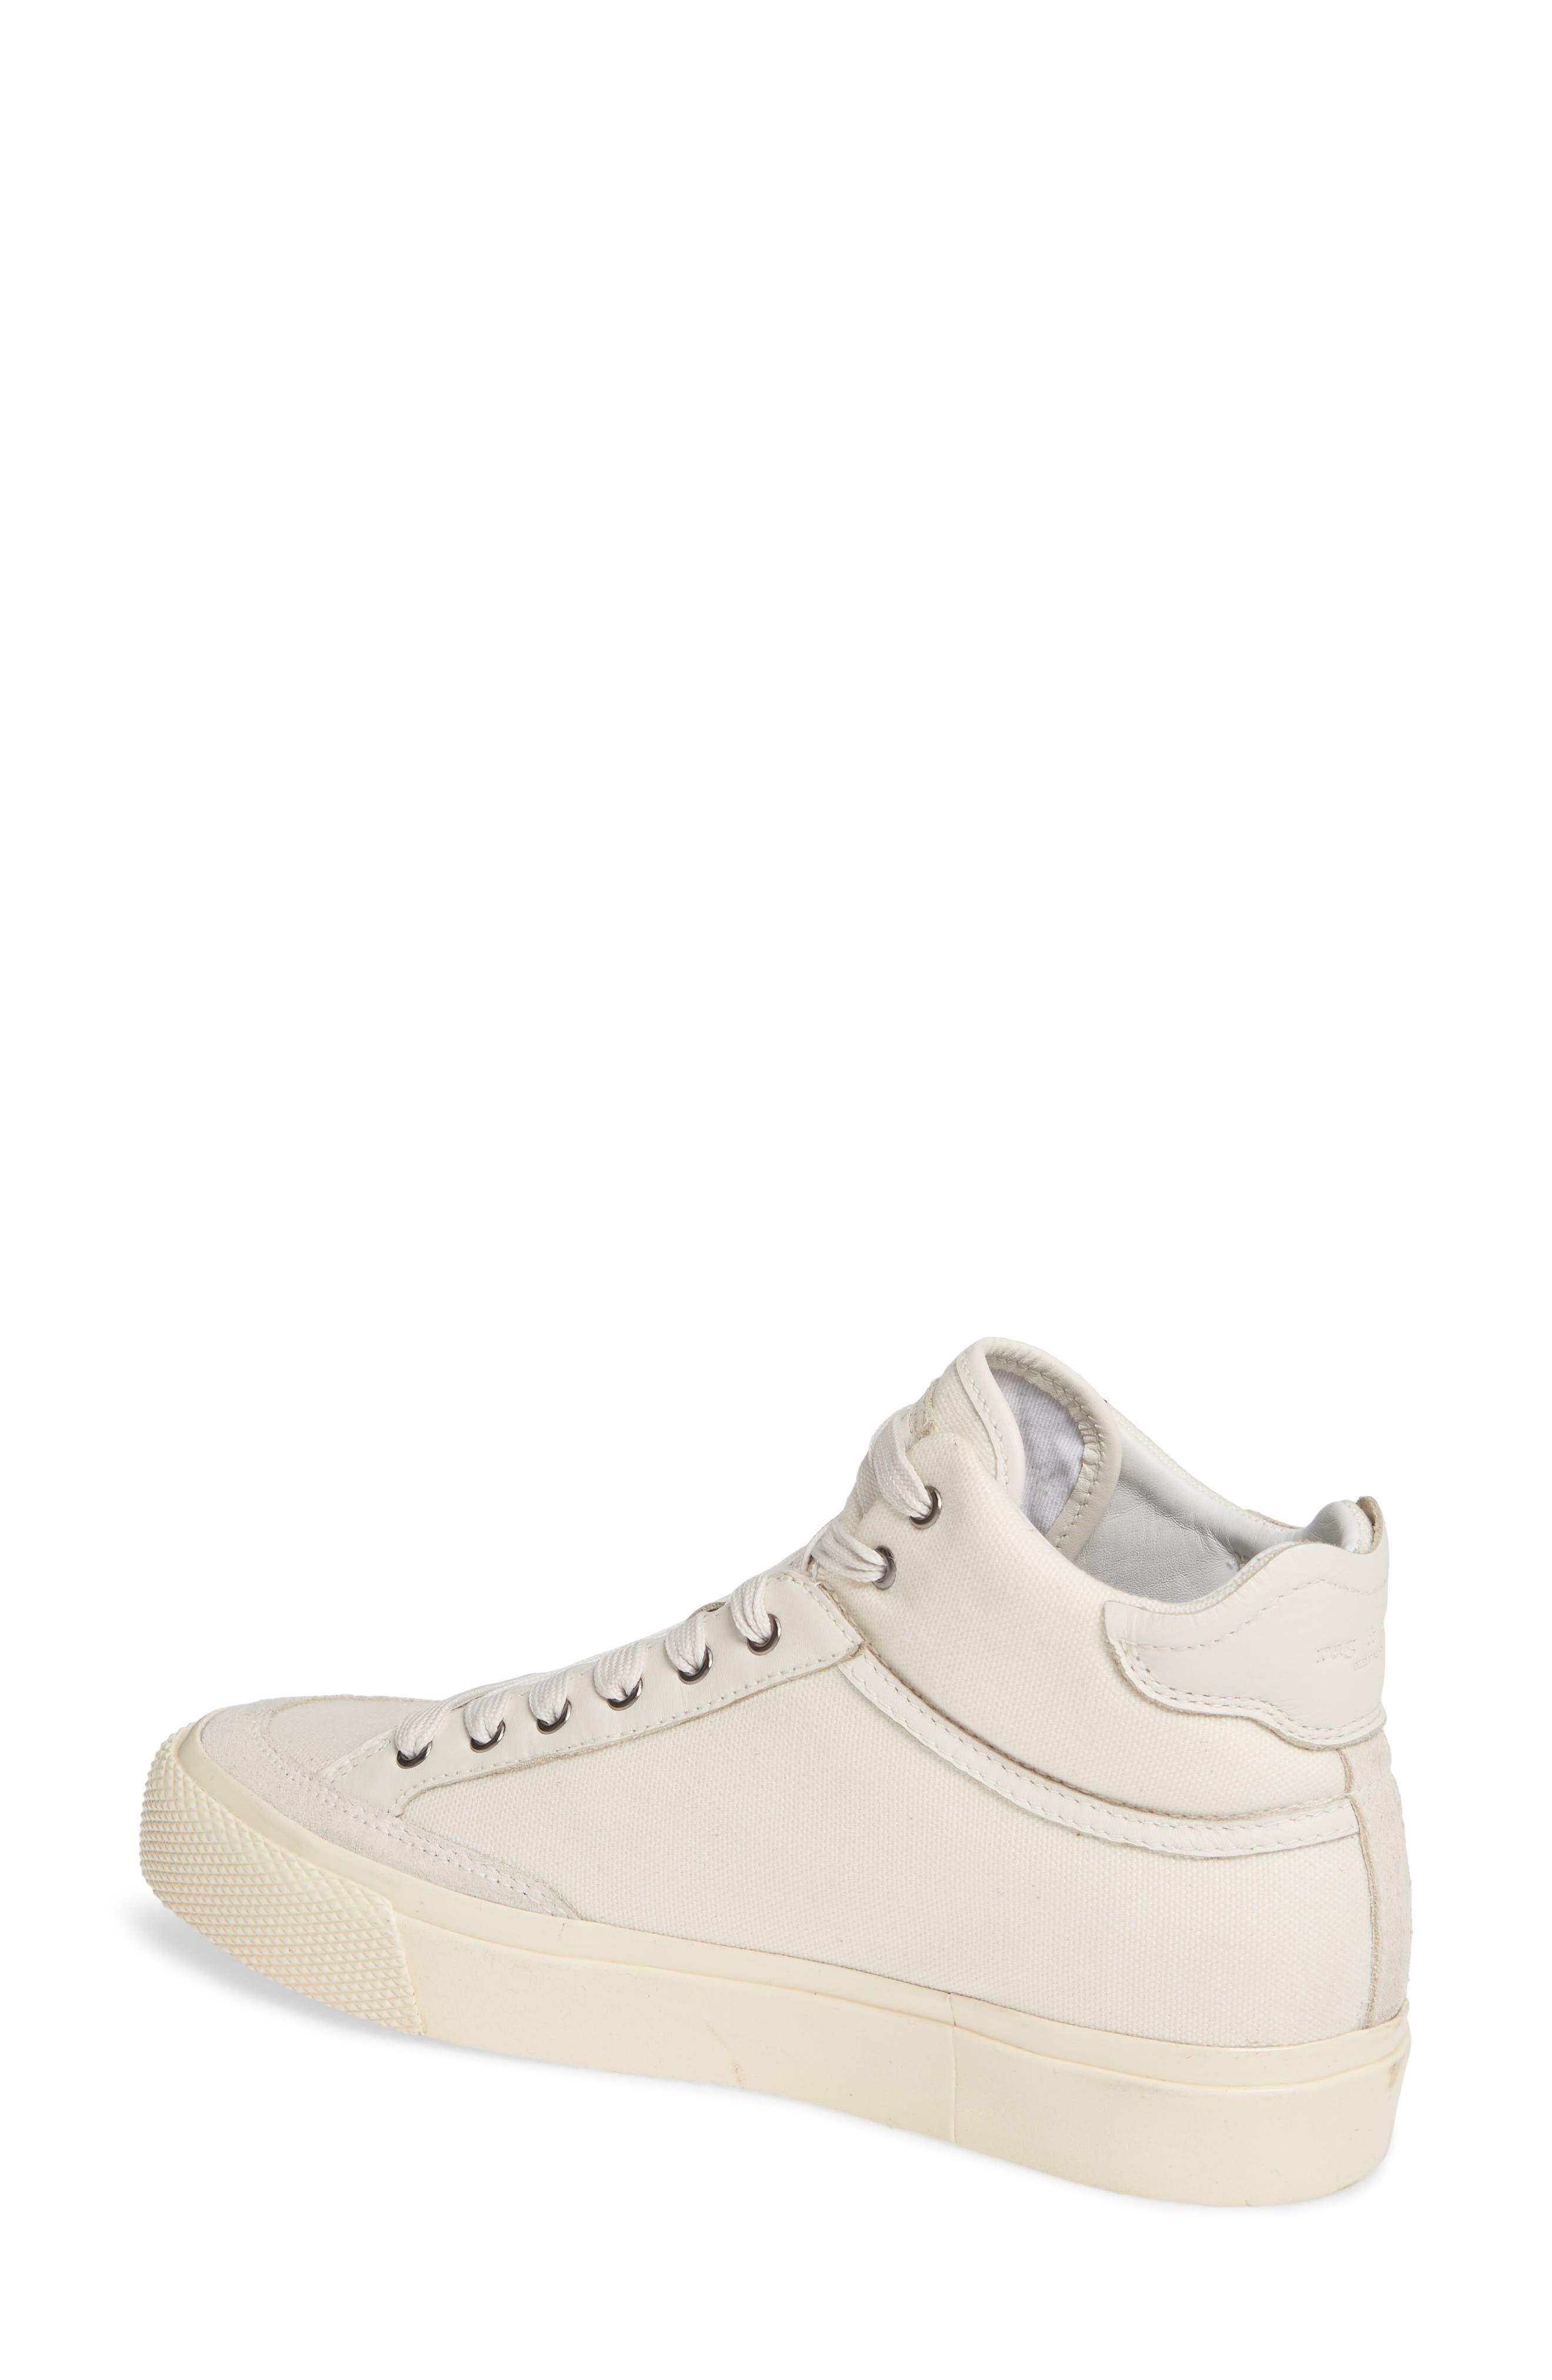 Army High Top Sneaker,                             Alternate thumbnail 2, color,                             ECRU CANVAS